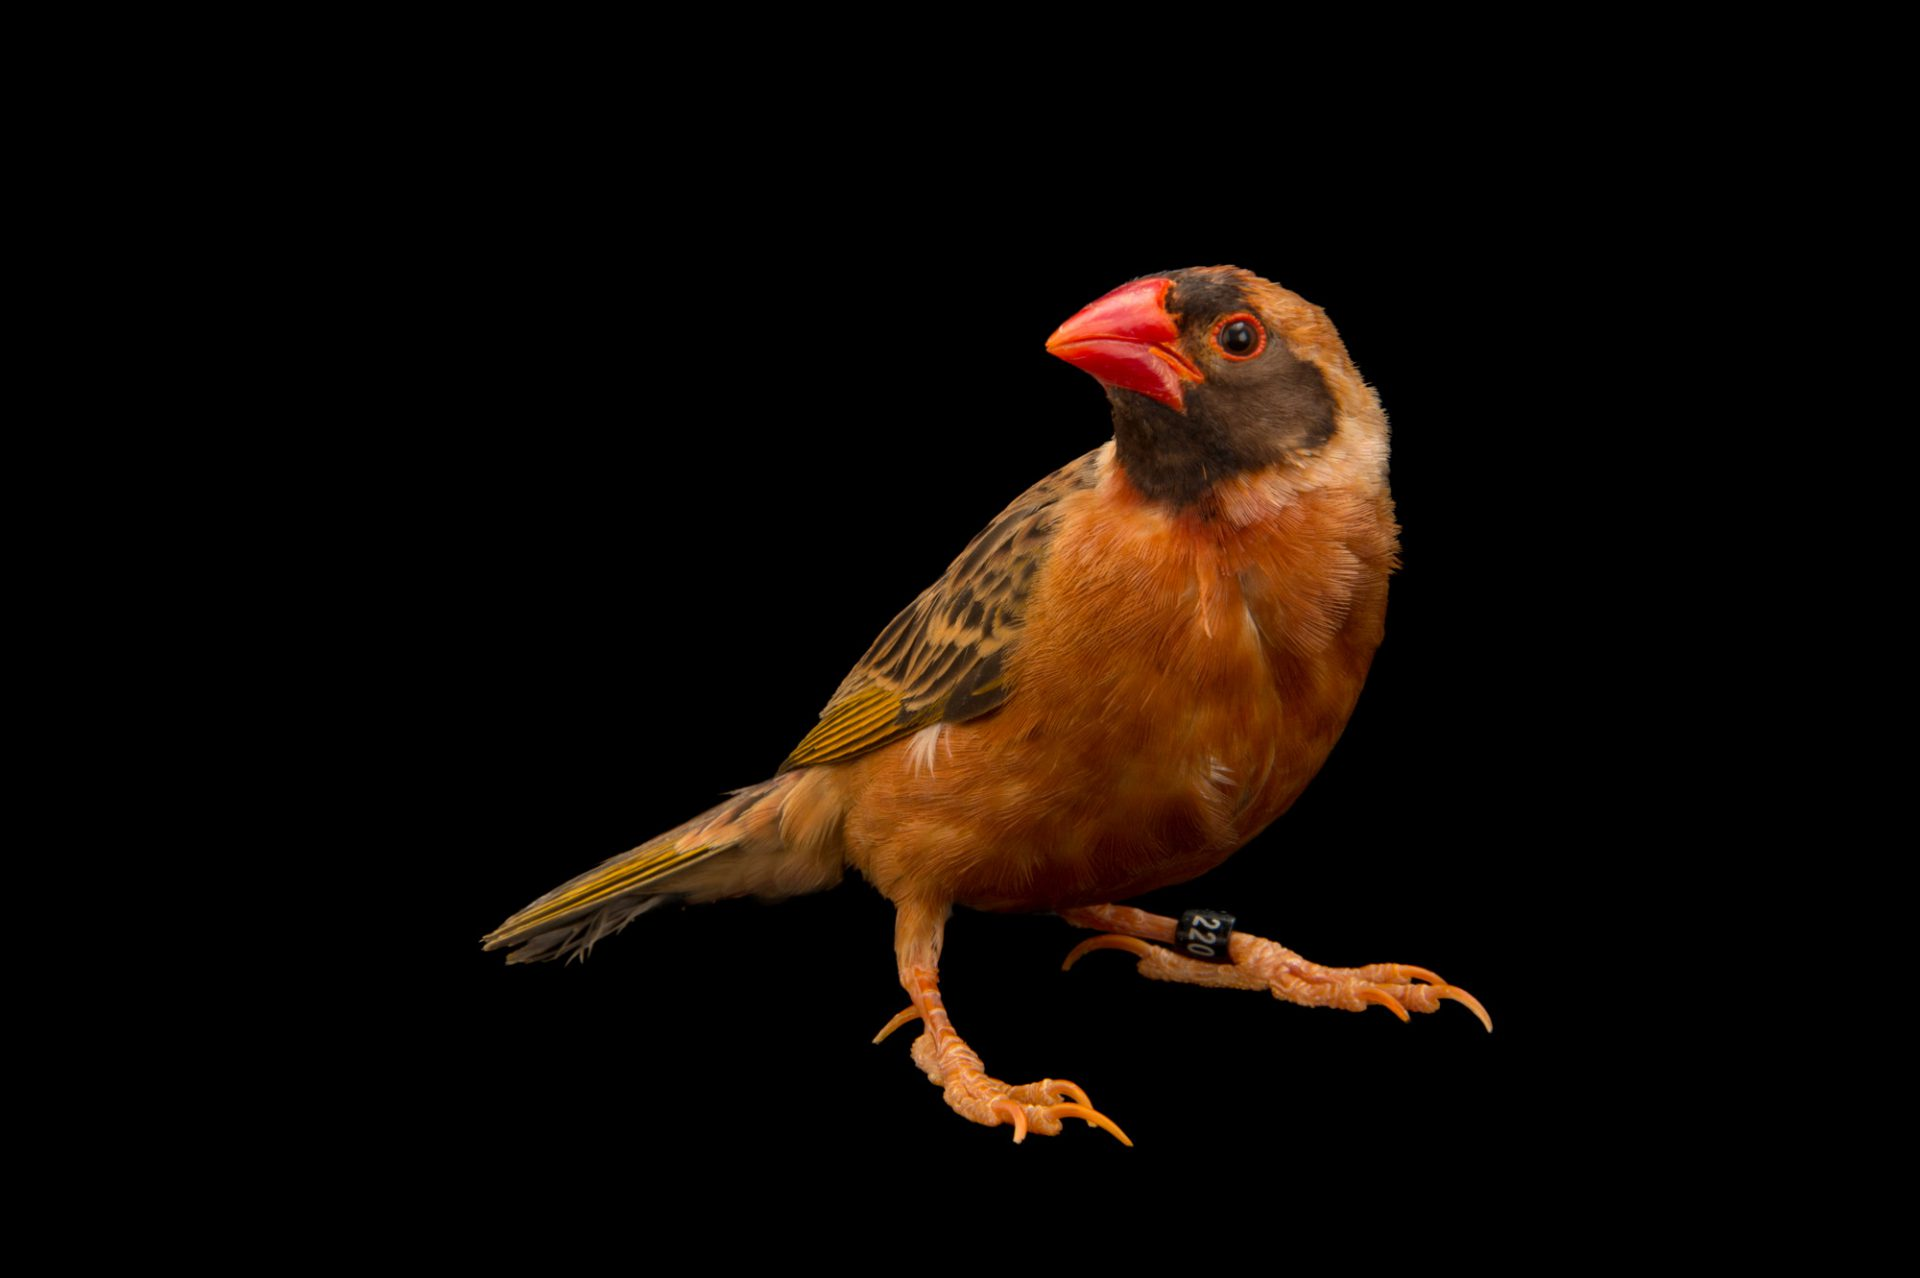 Photo: Red-billed quelea (Quelea quelea) in Choussy, France.